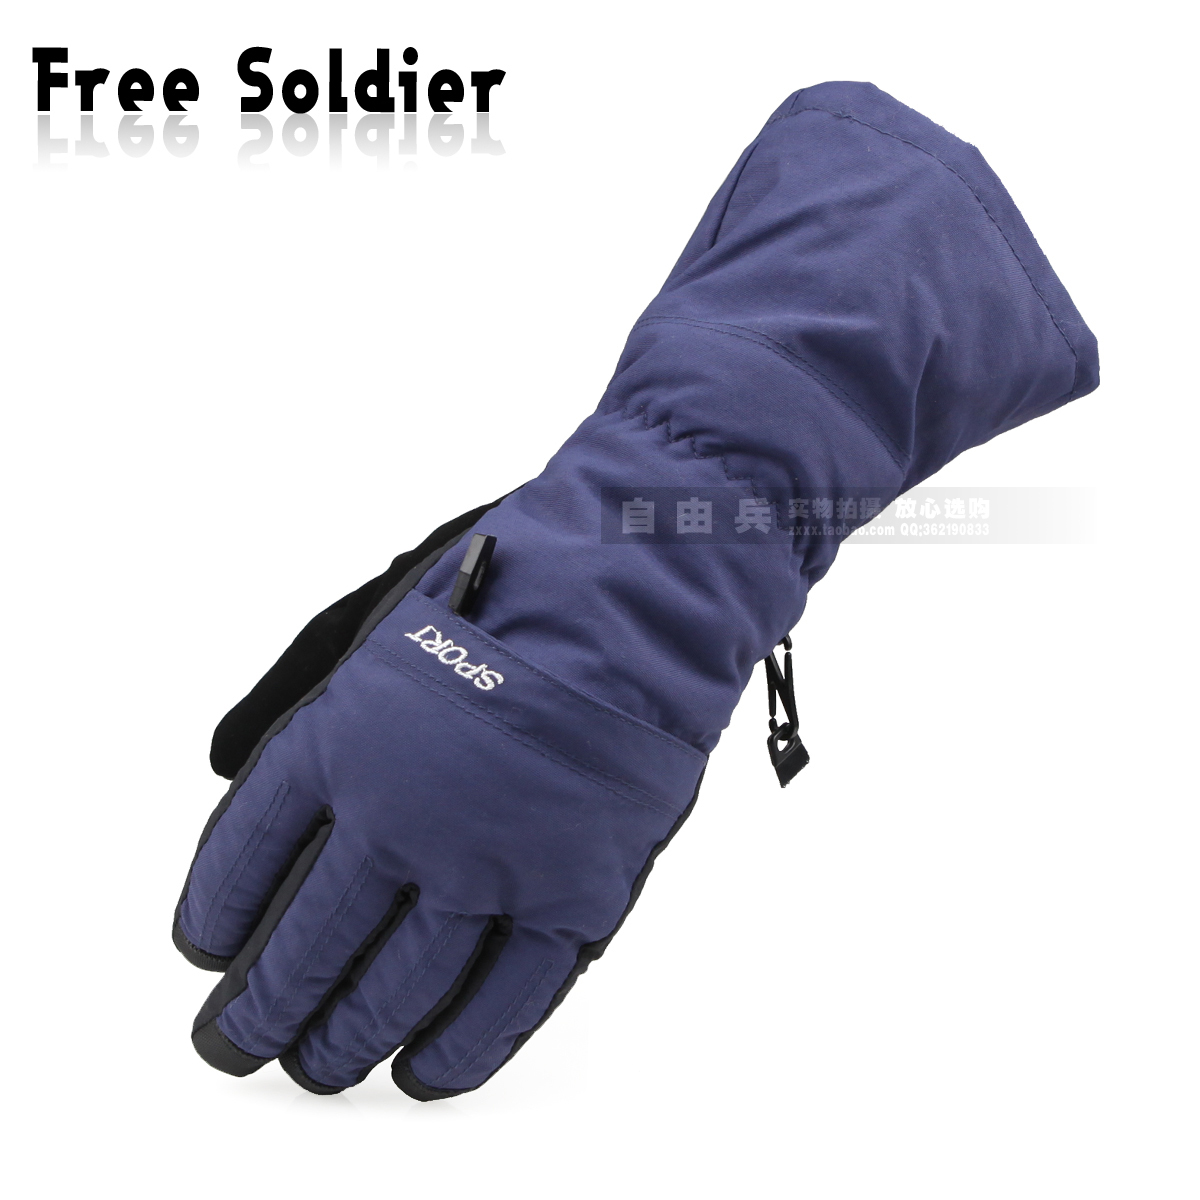 Перчатки для туризма и кемпинга Freesoldier free soldiers 54687 Free Soldier Freesoldier free soldiers Китай